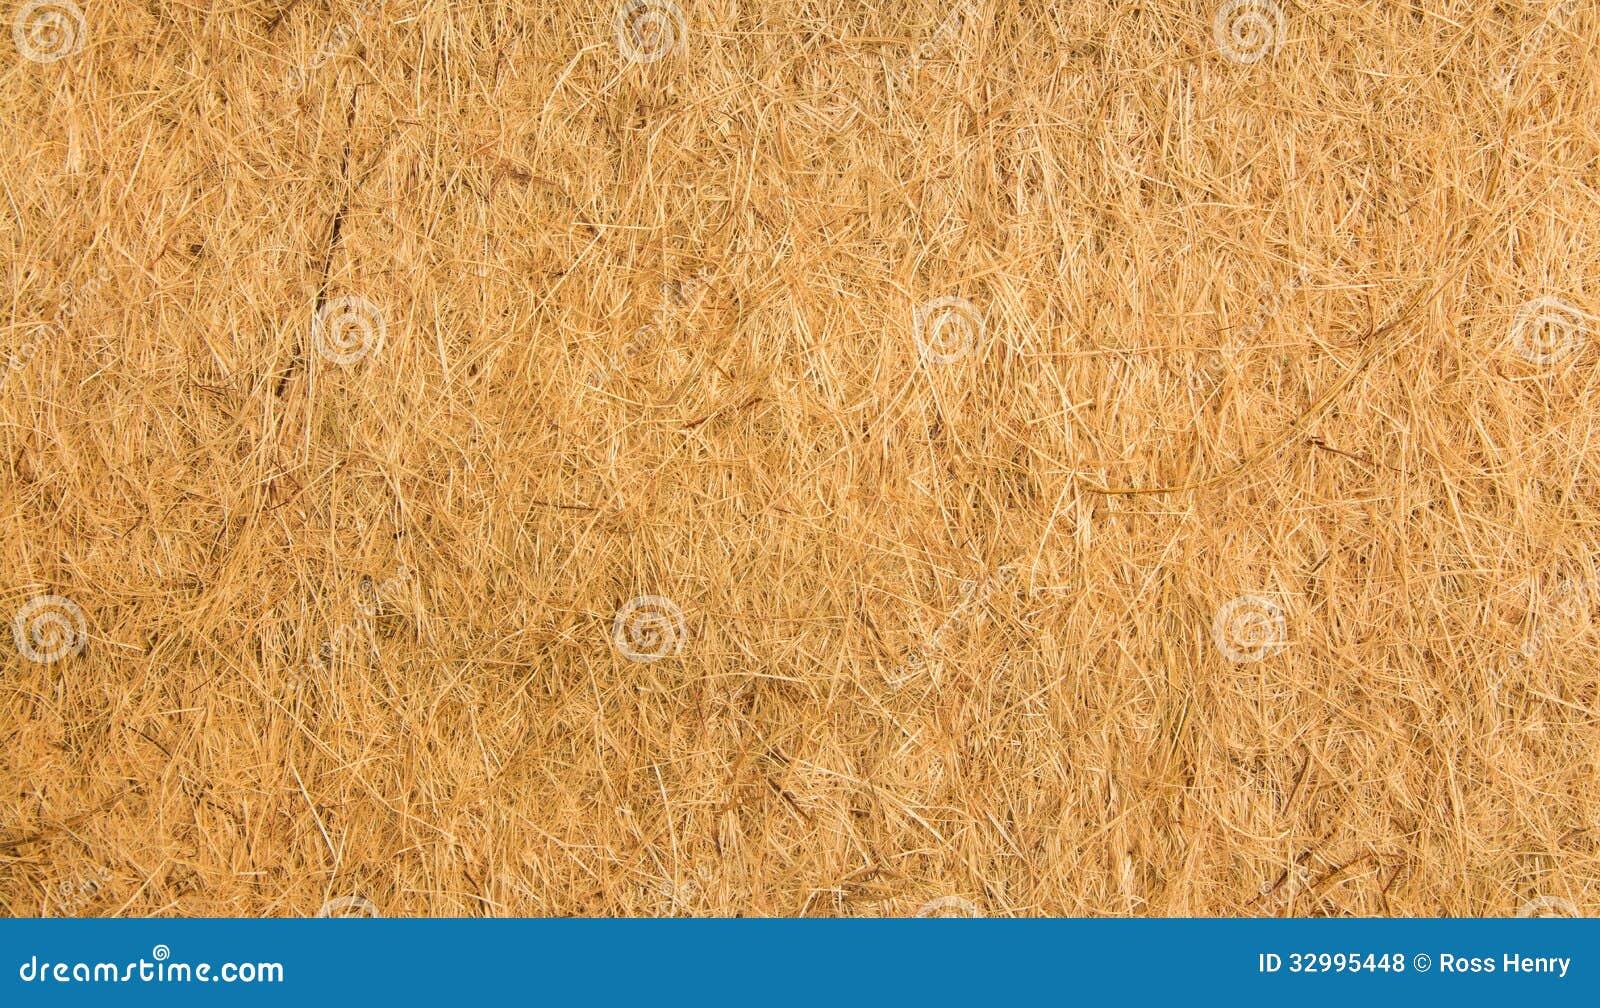 Flax fiber texture royalty free stock photos image 32995448 for Carpet underlay texture